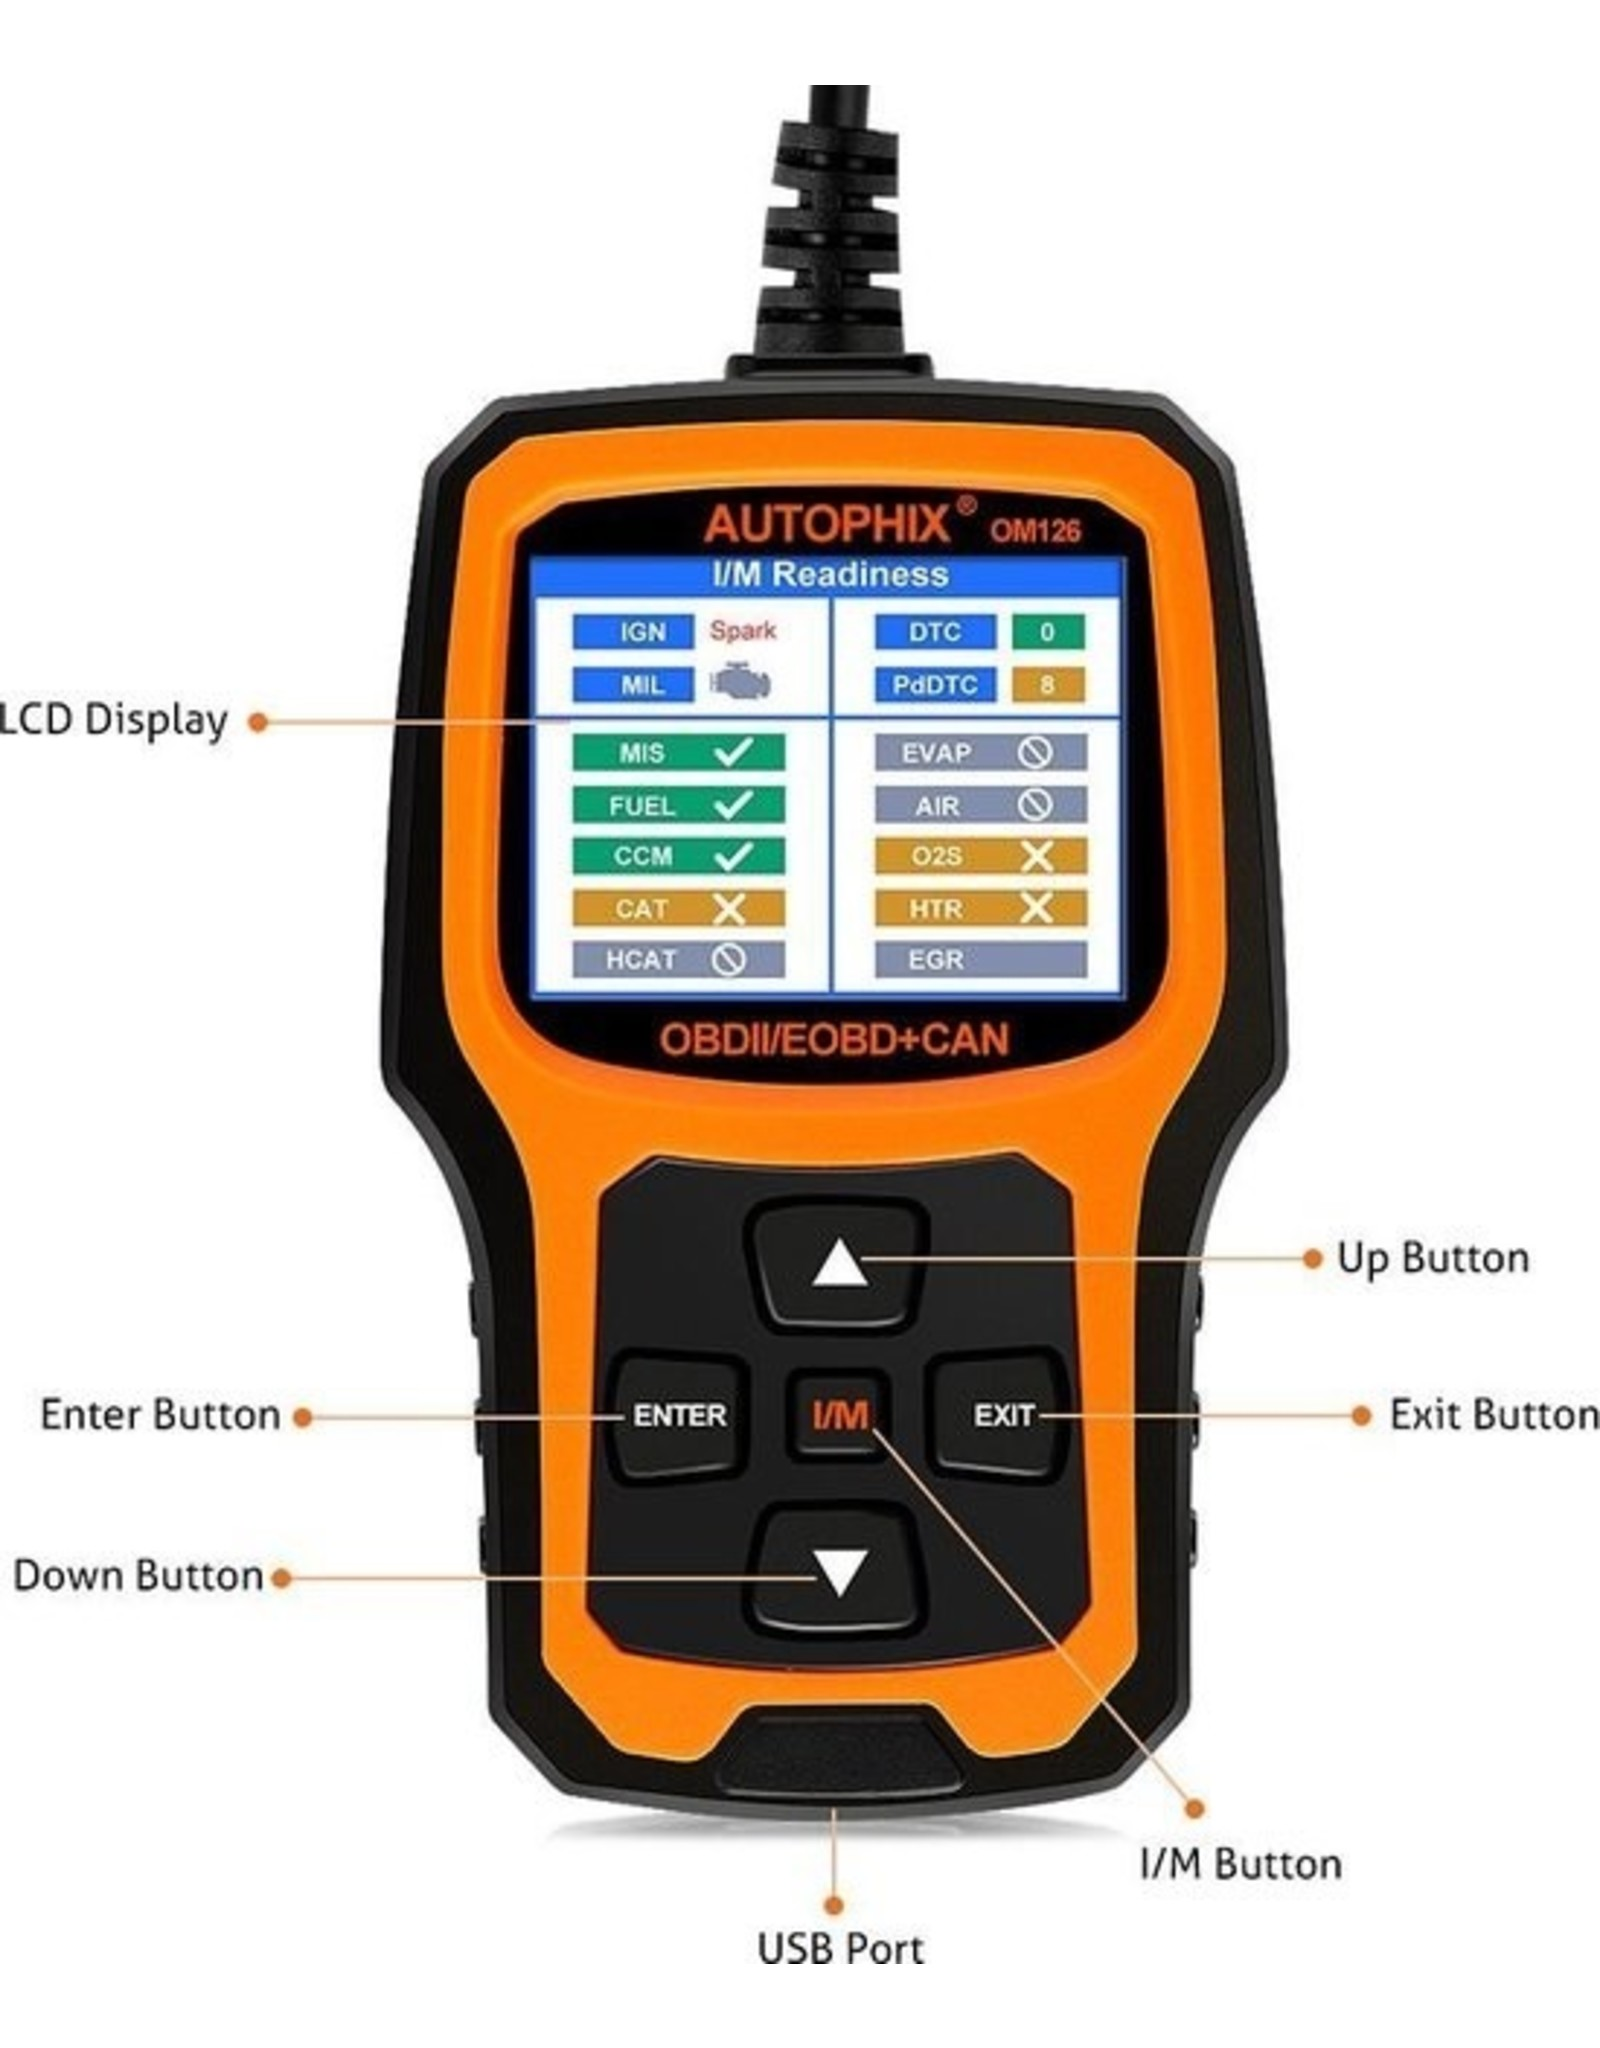 Merkloos Autophix OBD2 / EOBD Diagnosecomputer   Uitleesapparaat OM126 - Volledig origineel